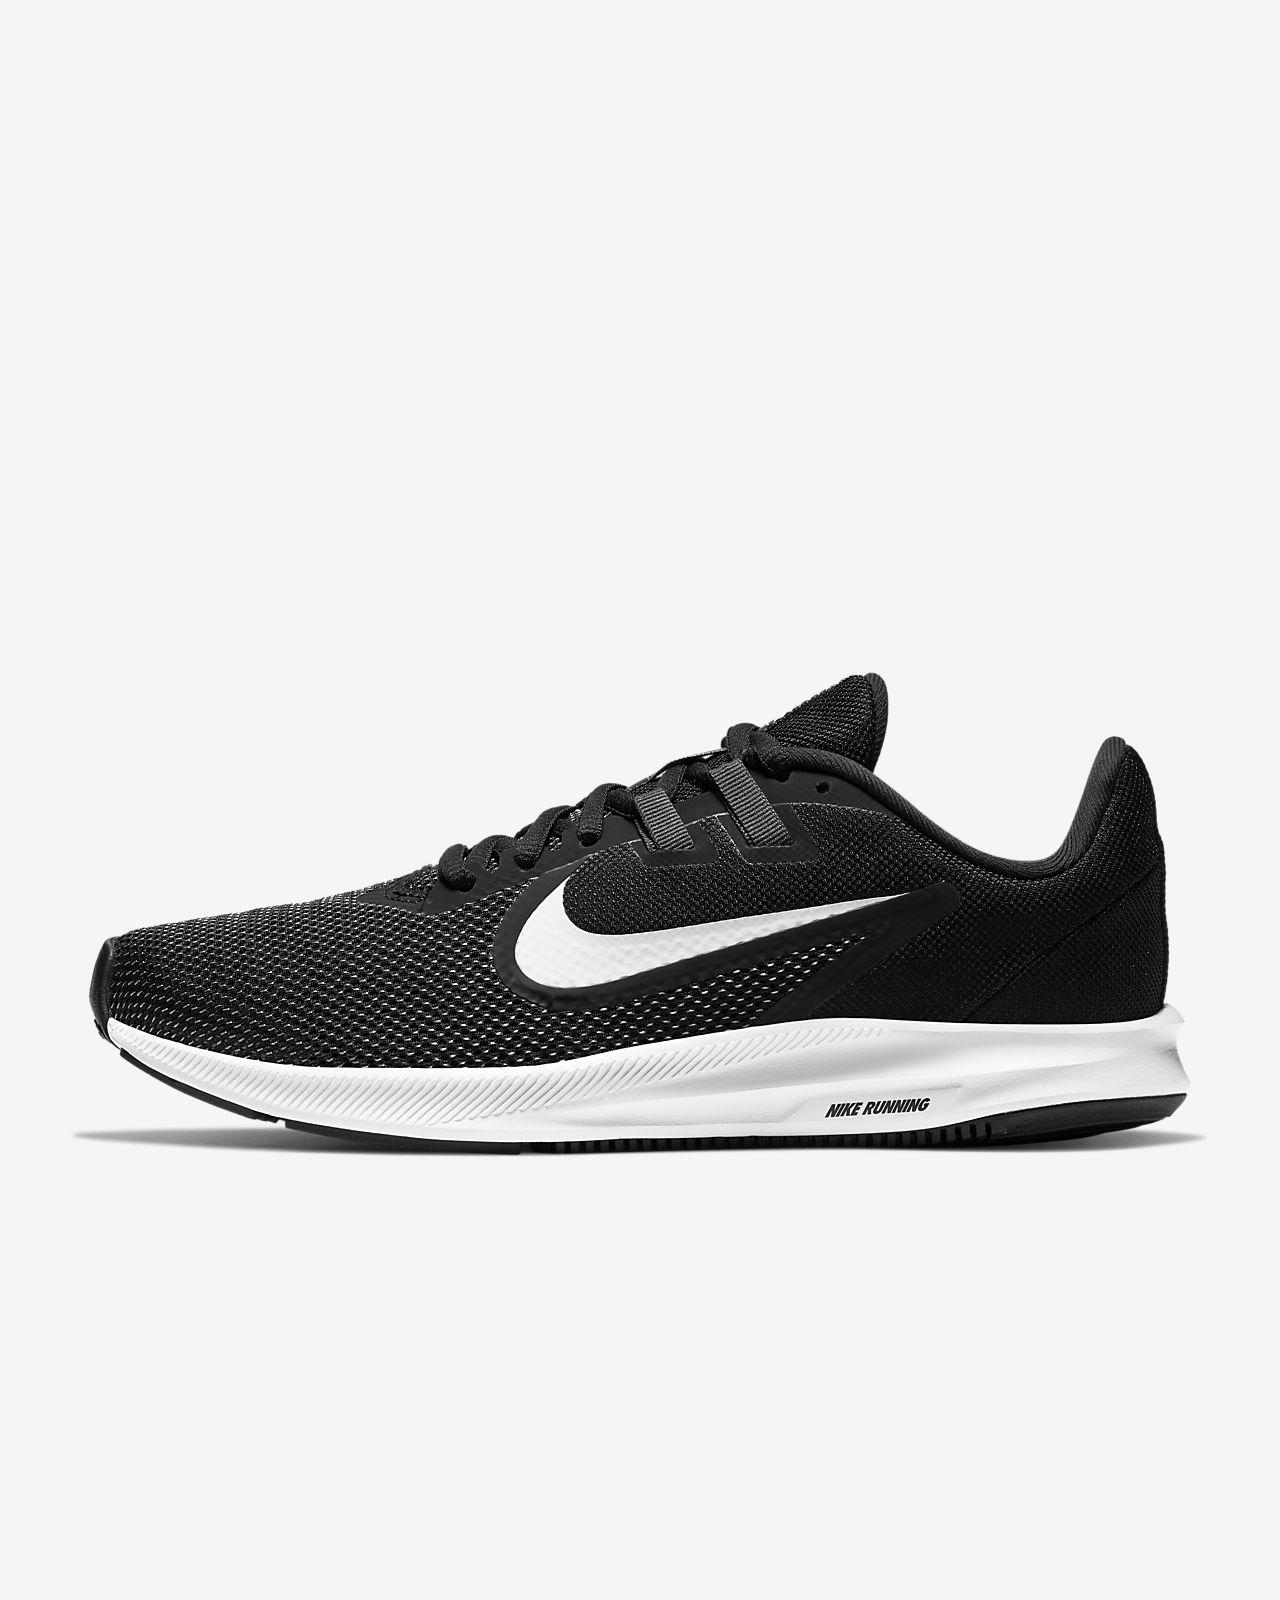 Sapatilhas de running Nike Downshifter 9 para mulher